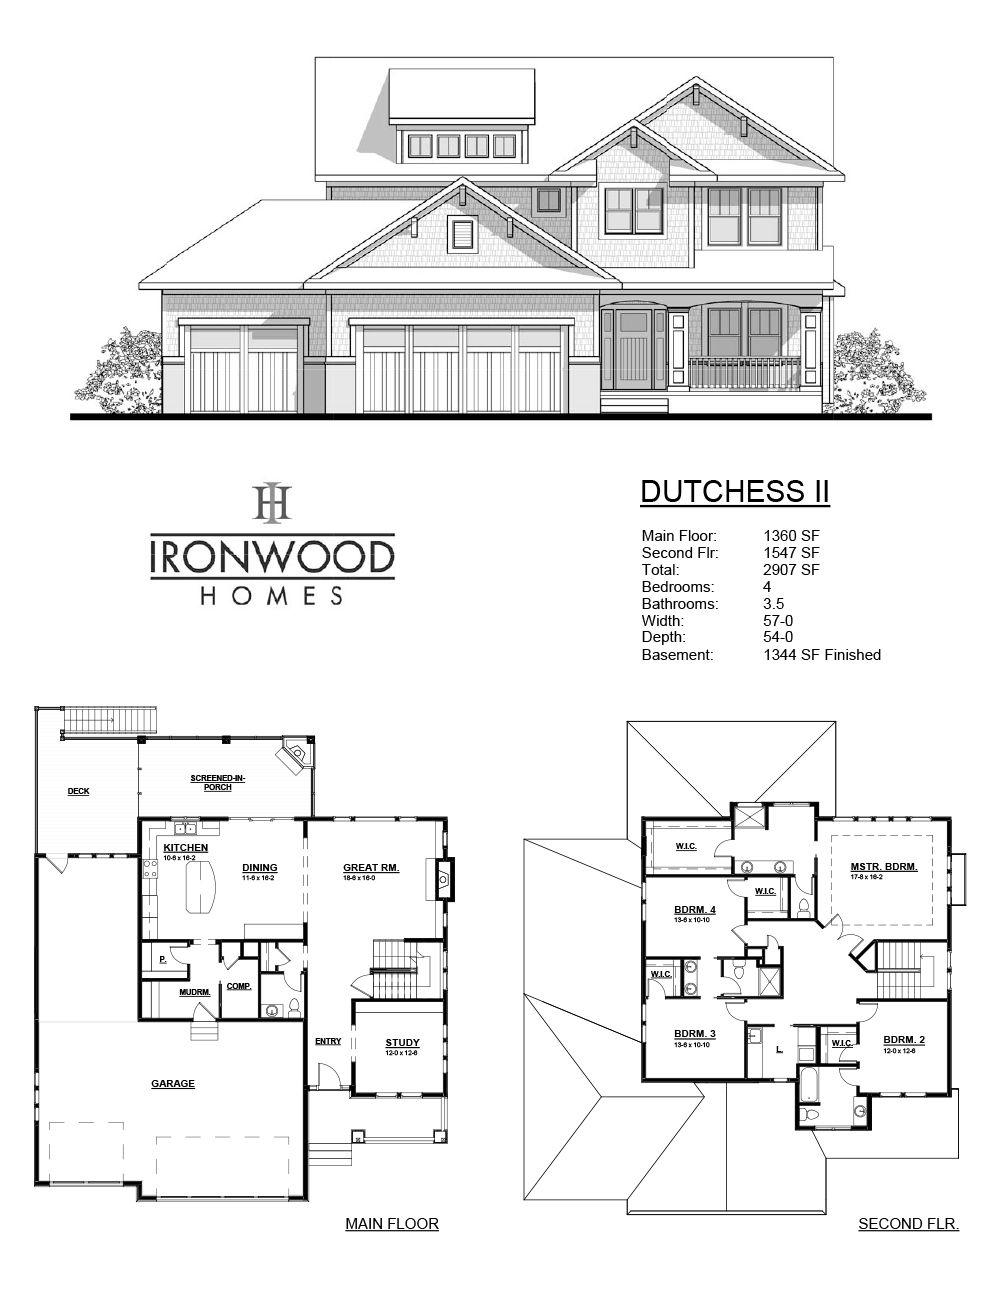 Dutchess Ii Floor Plan Info Sheet Floor Plans New Home Wishes House Plans